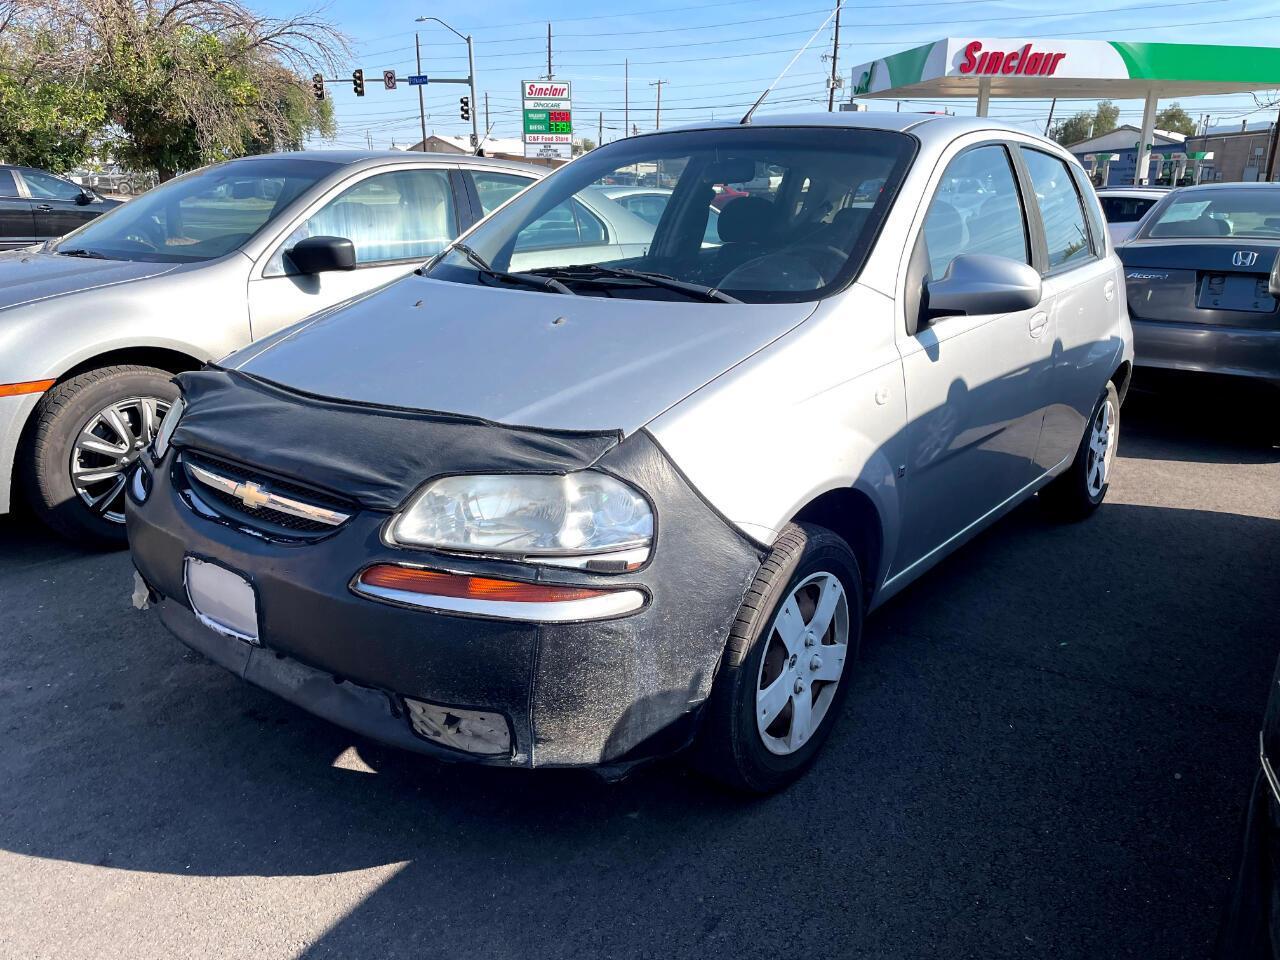 Chevrolet Aveo 5dr HB SVM 2008